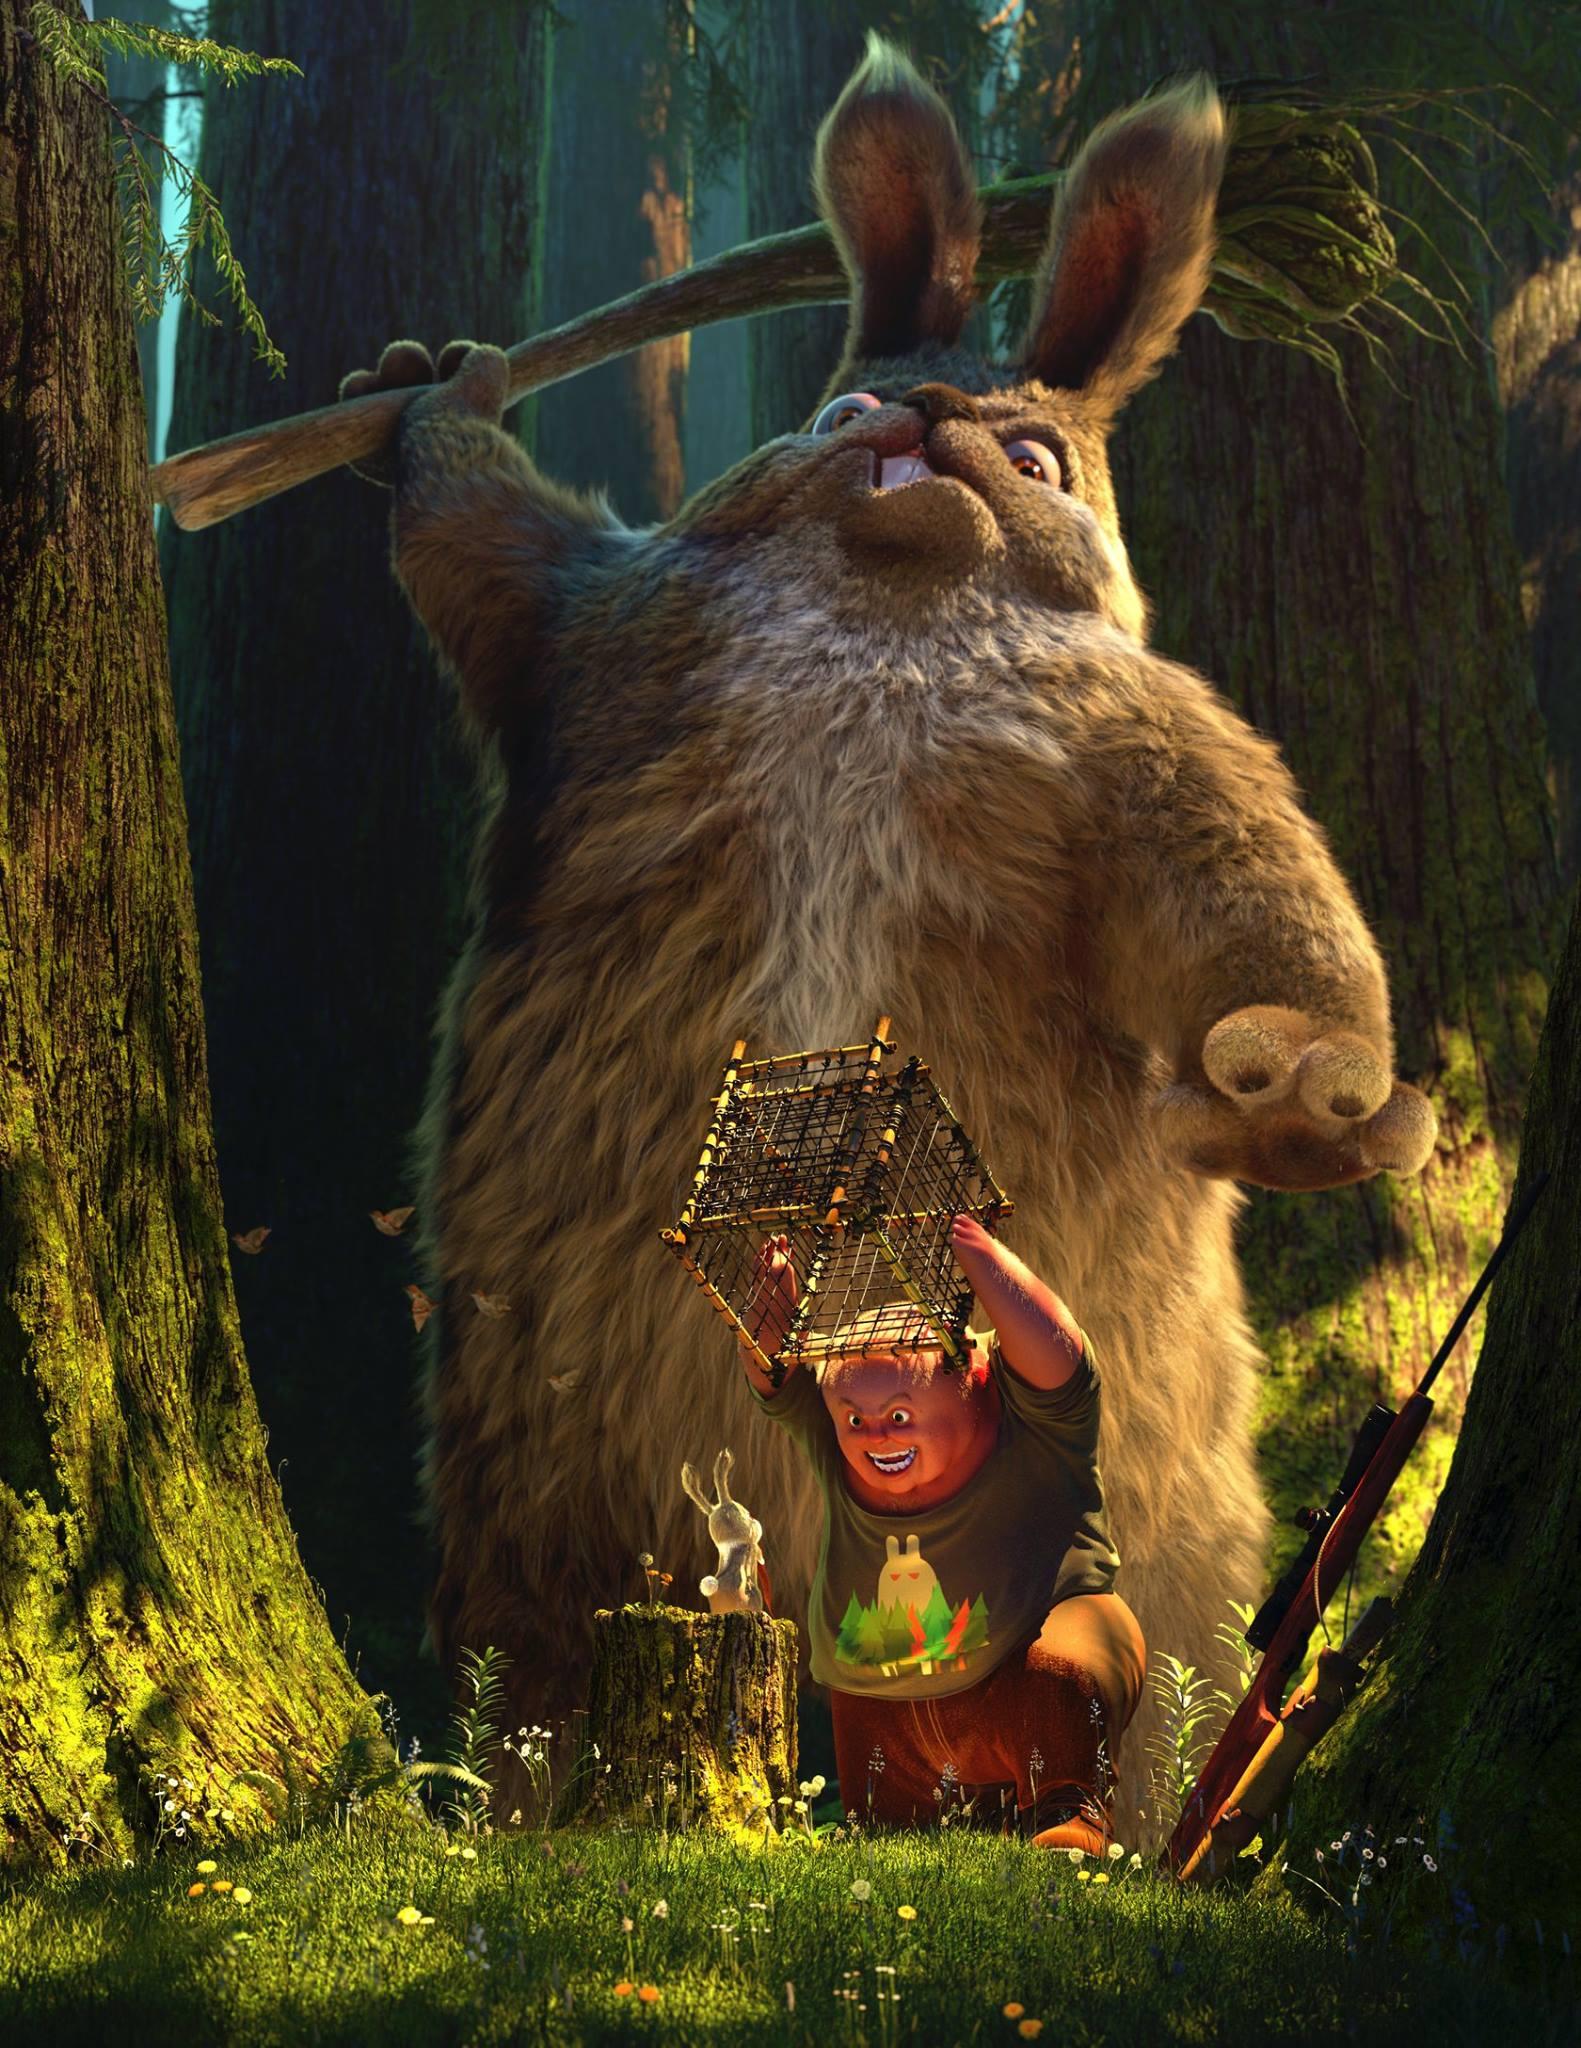 3d-maya-yeti-arnold-zbrush-mari-forest-of-bunnies-dong-liang